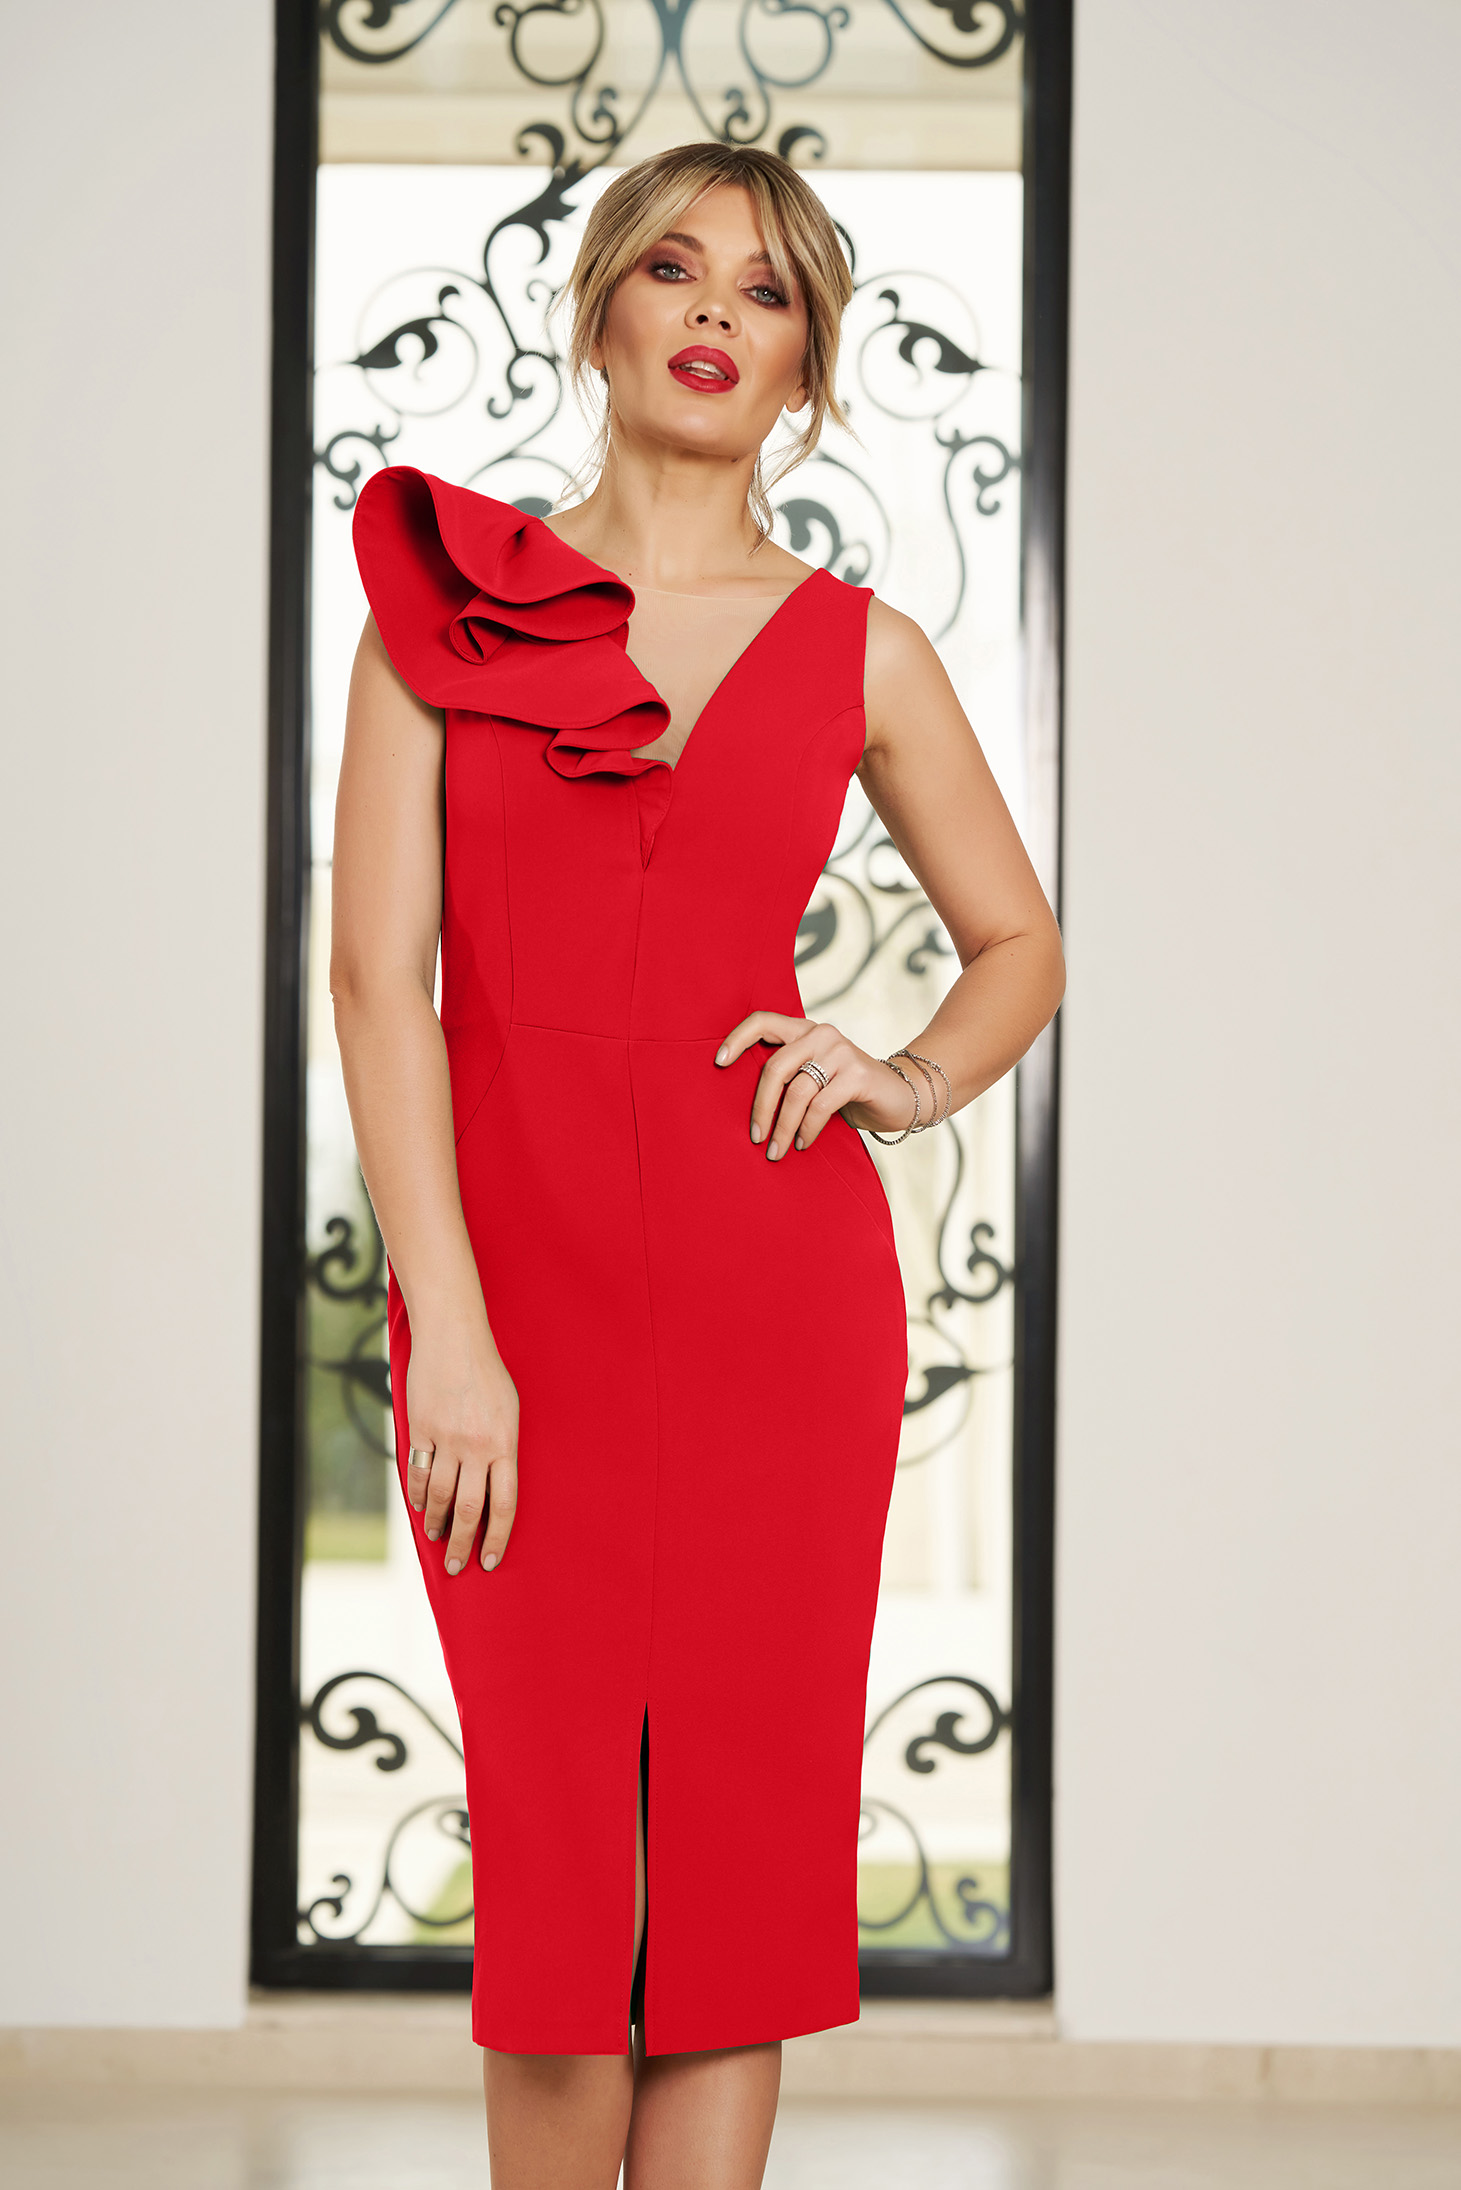 Rochie StarShinerS rosie midi de ocazie tip creion din stofa usor elastica cu volanase cu rijelina